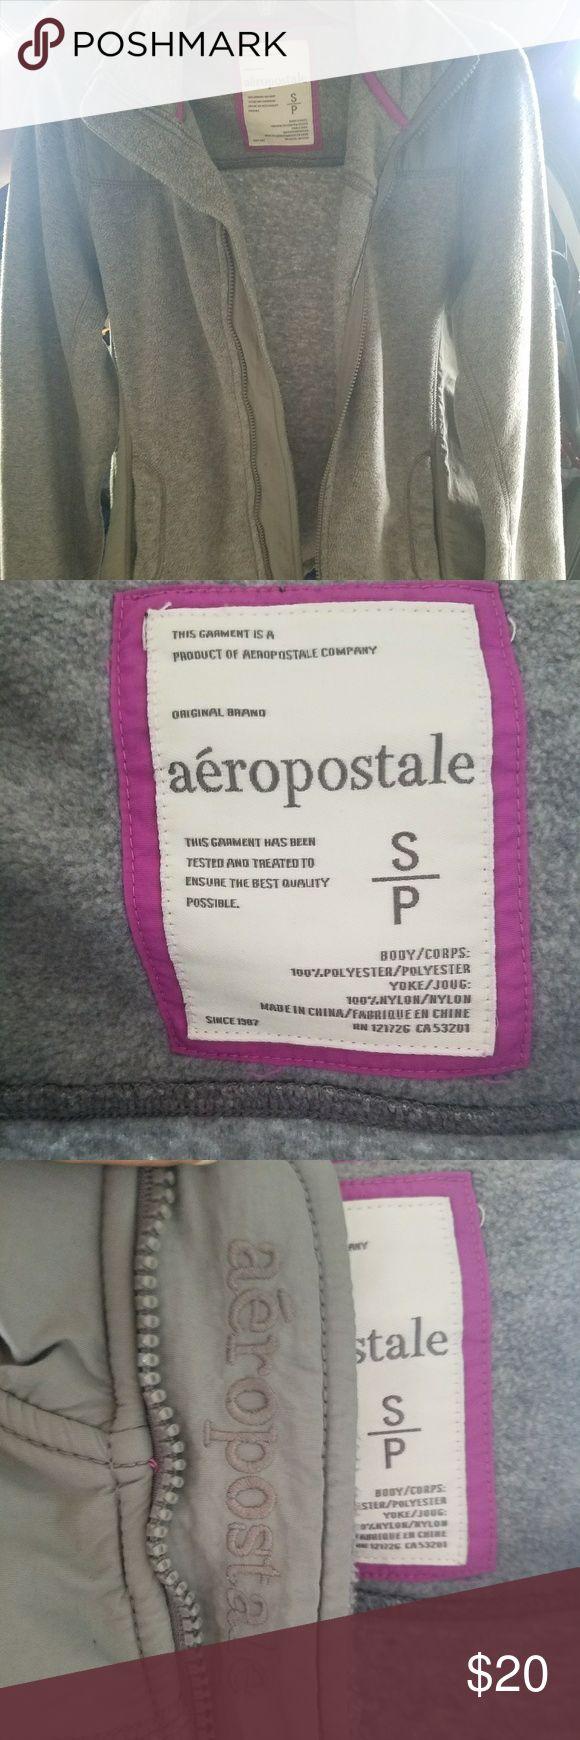 Aeropostale Fleece zip up warm jacket (Small) Comfy neutral jacket styled like a common Northface jacket. No flaws, smoke-free home. OFFERS ACCEPTED! (: Aeropostale Jackets & Coats